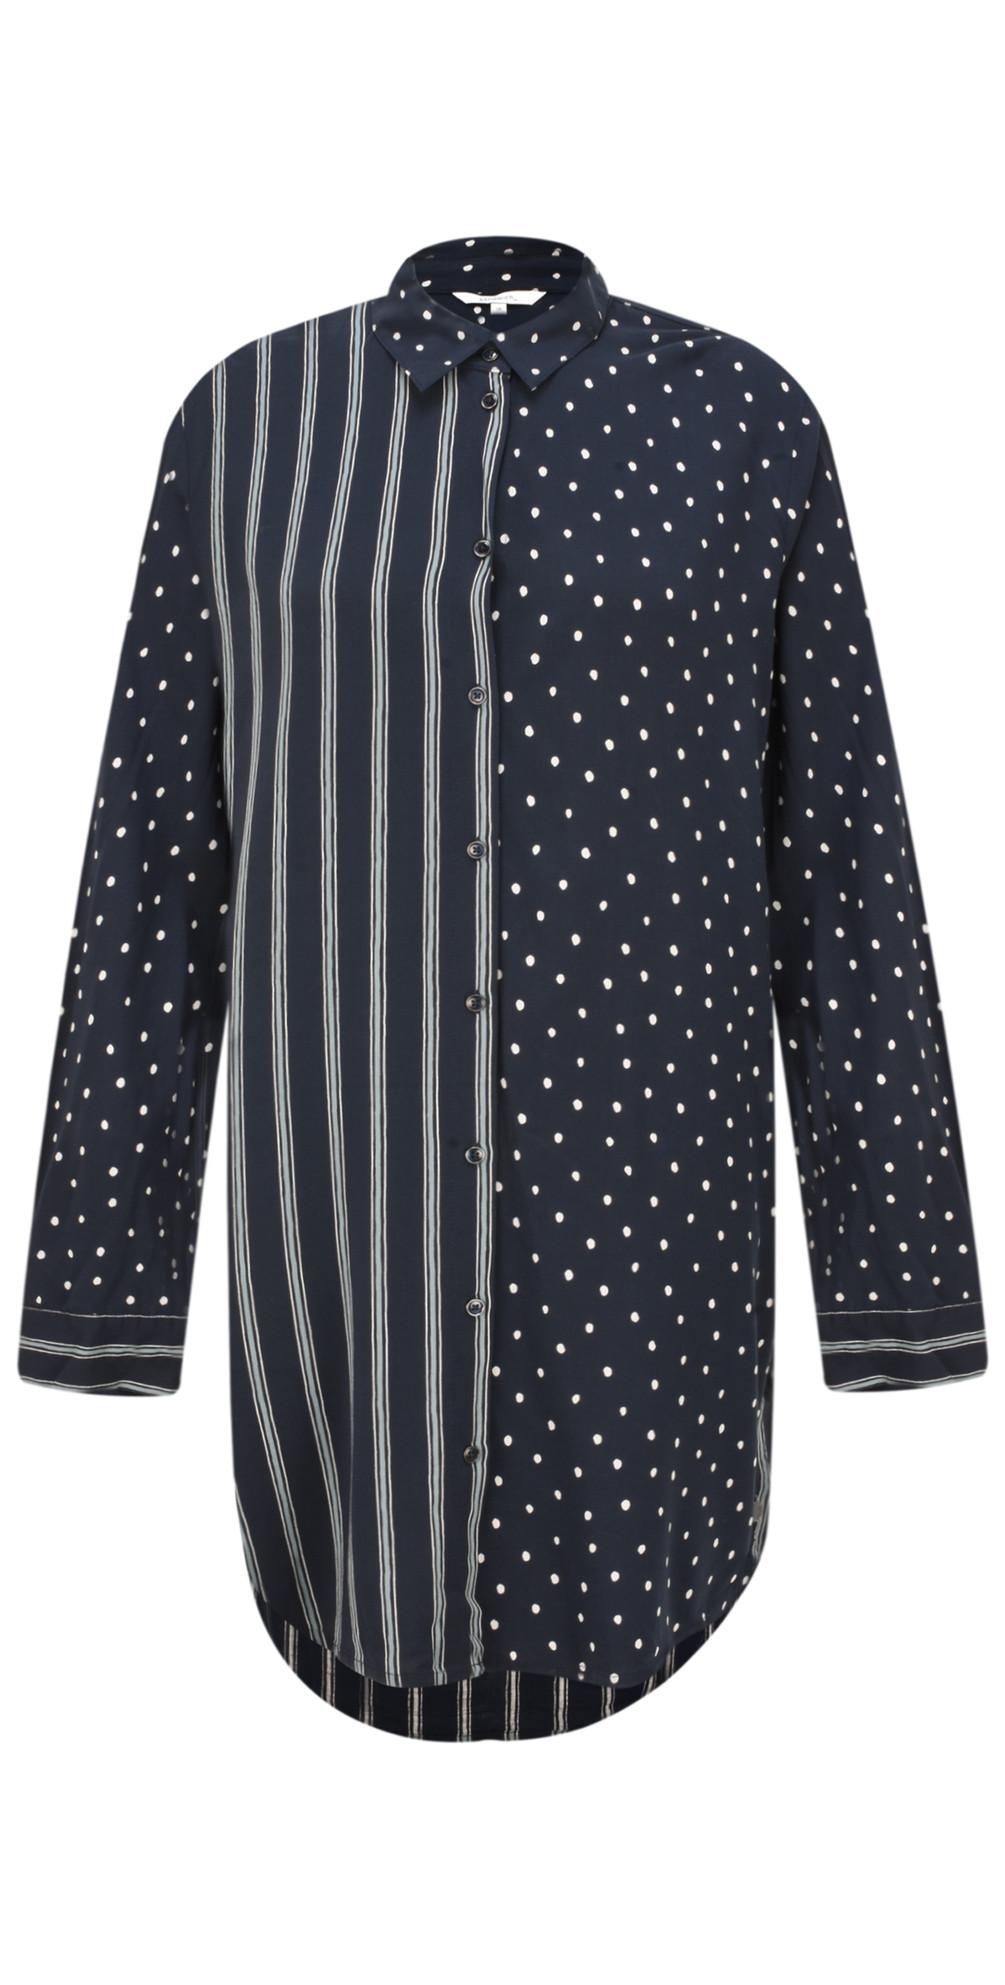 Spots & Stripes Tunic Shirt main image